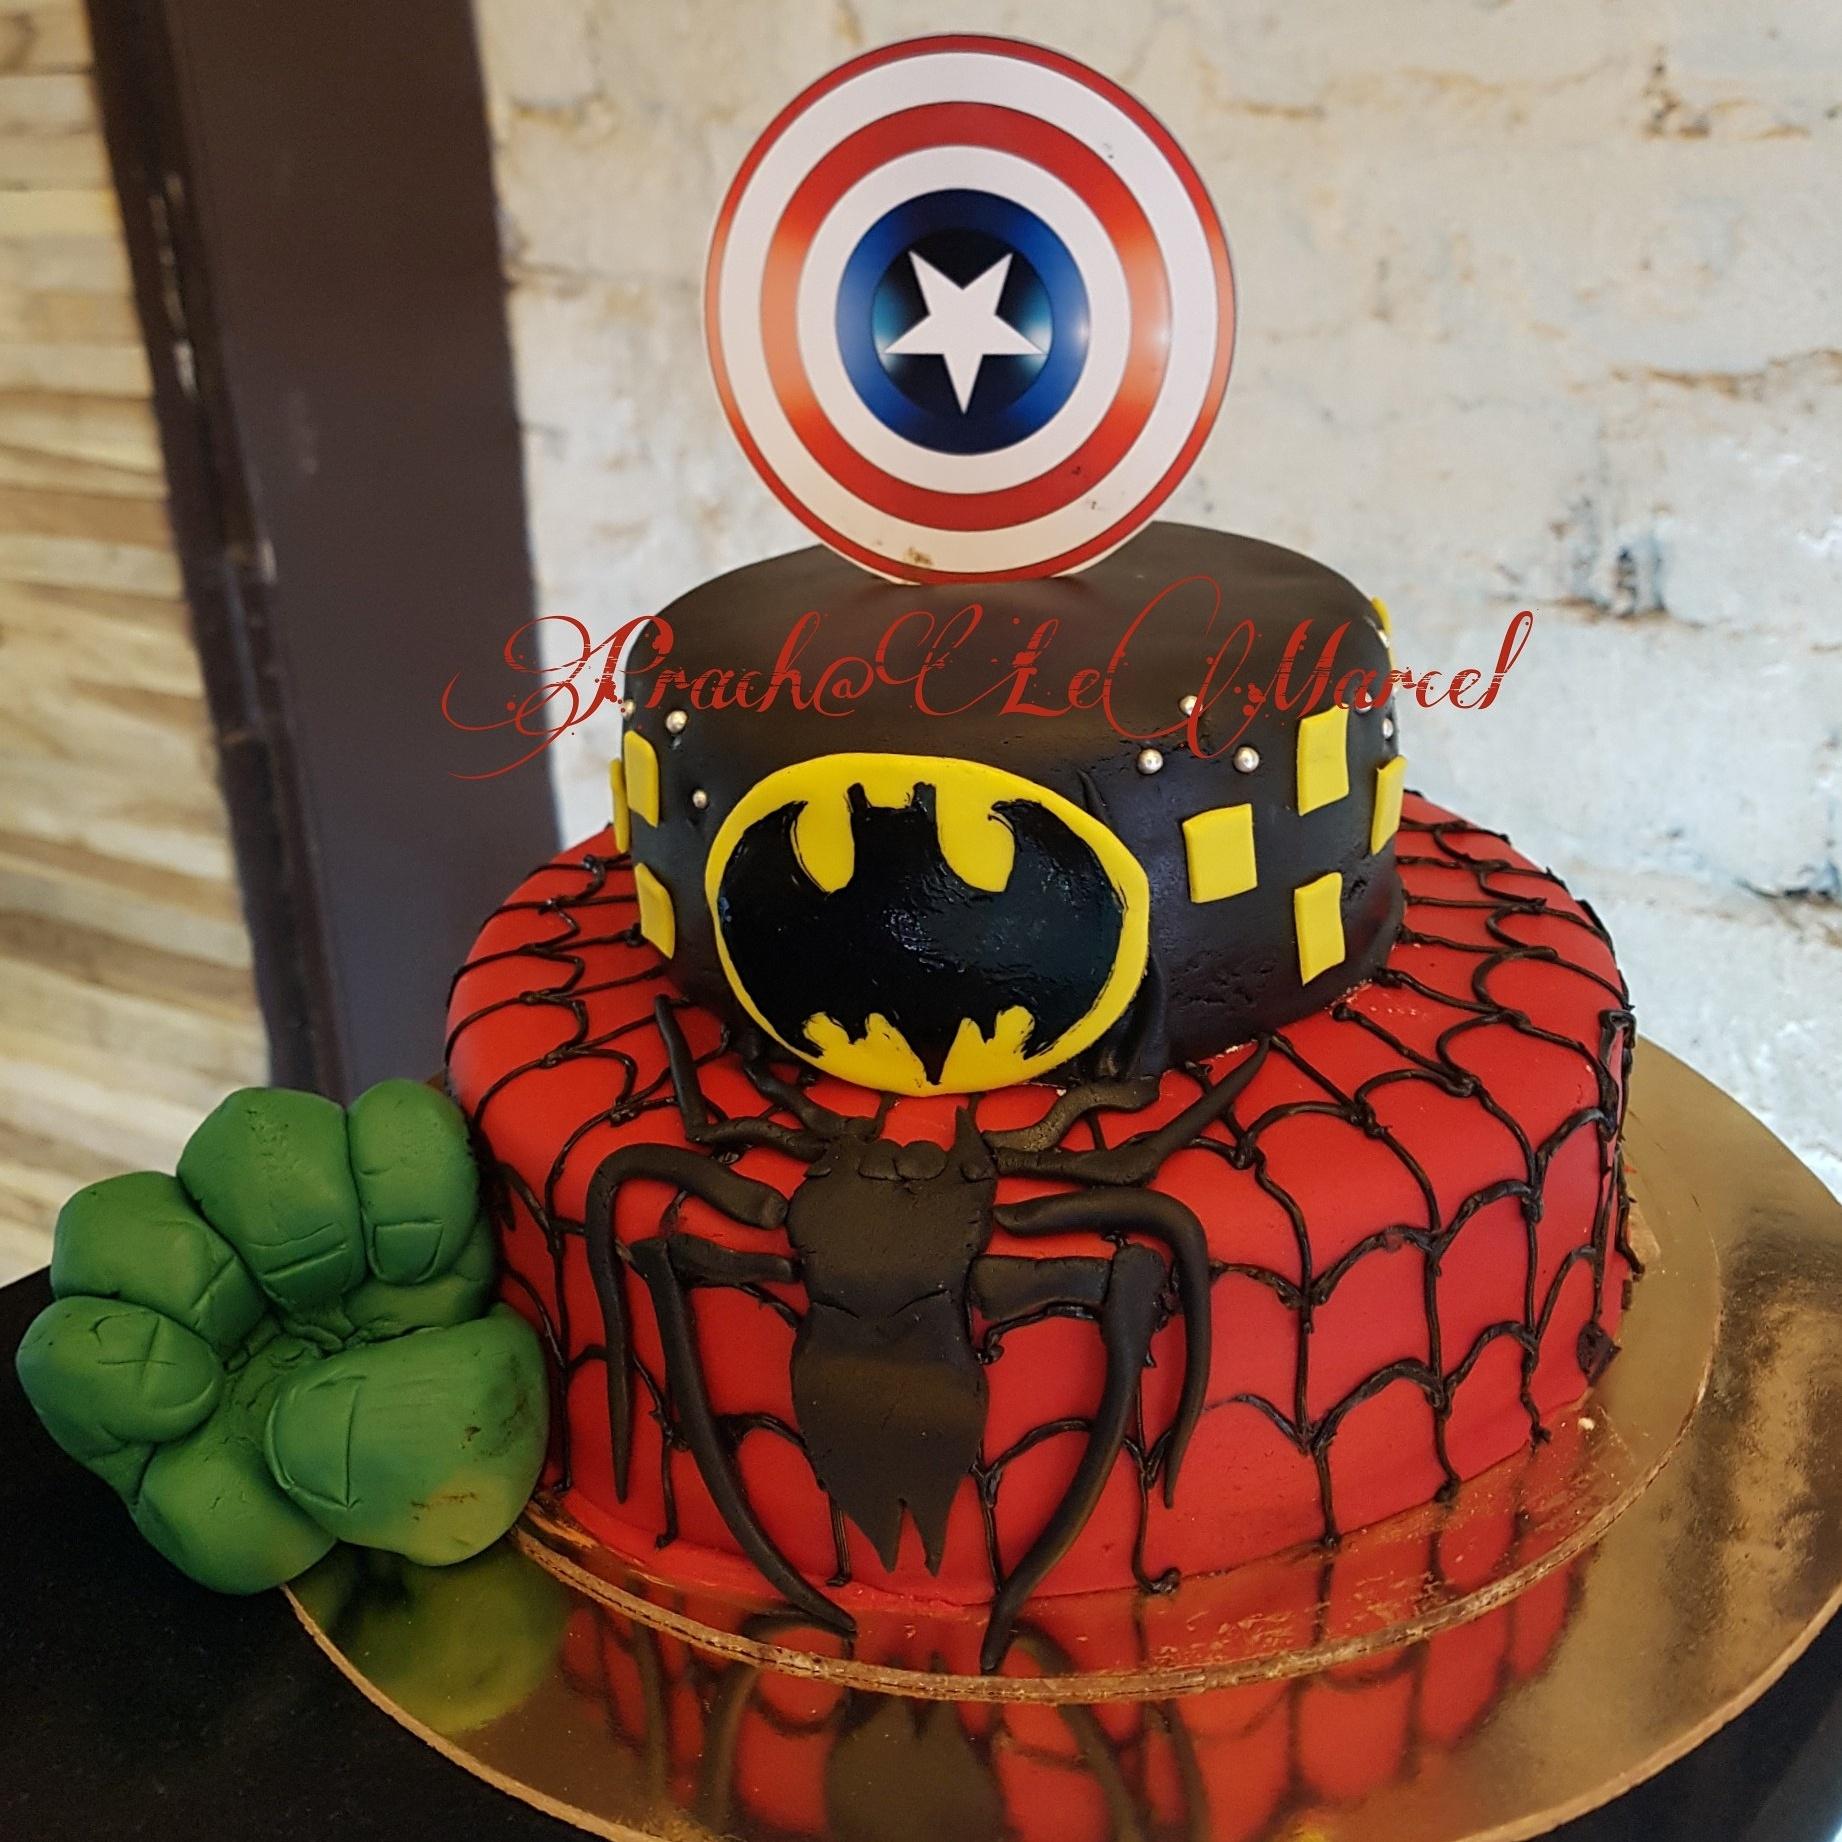 Cake Delivery Services Dahanu Mumbai